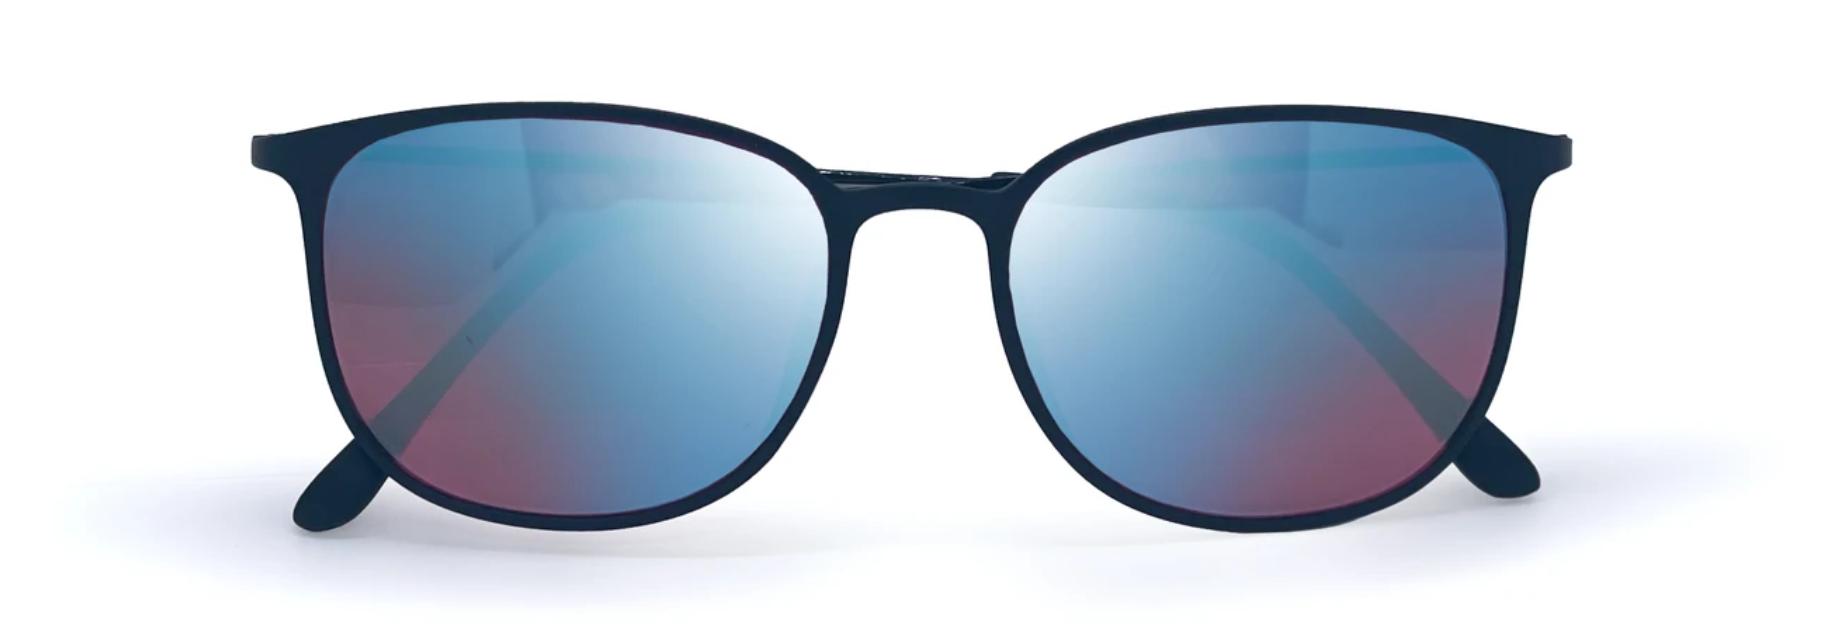 glasses_2x_8a77c27f-ea18-4f50-a7bc-87385ede8458